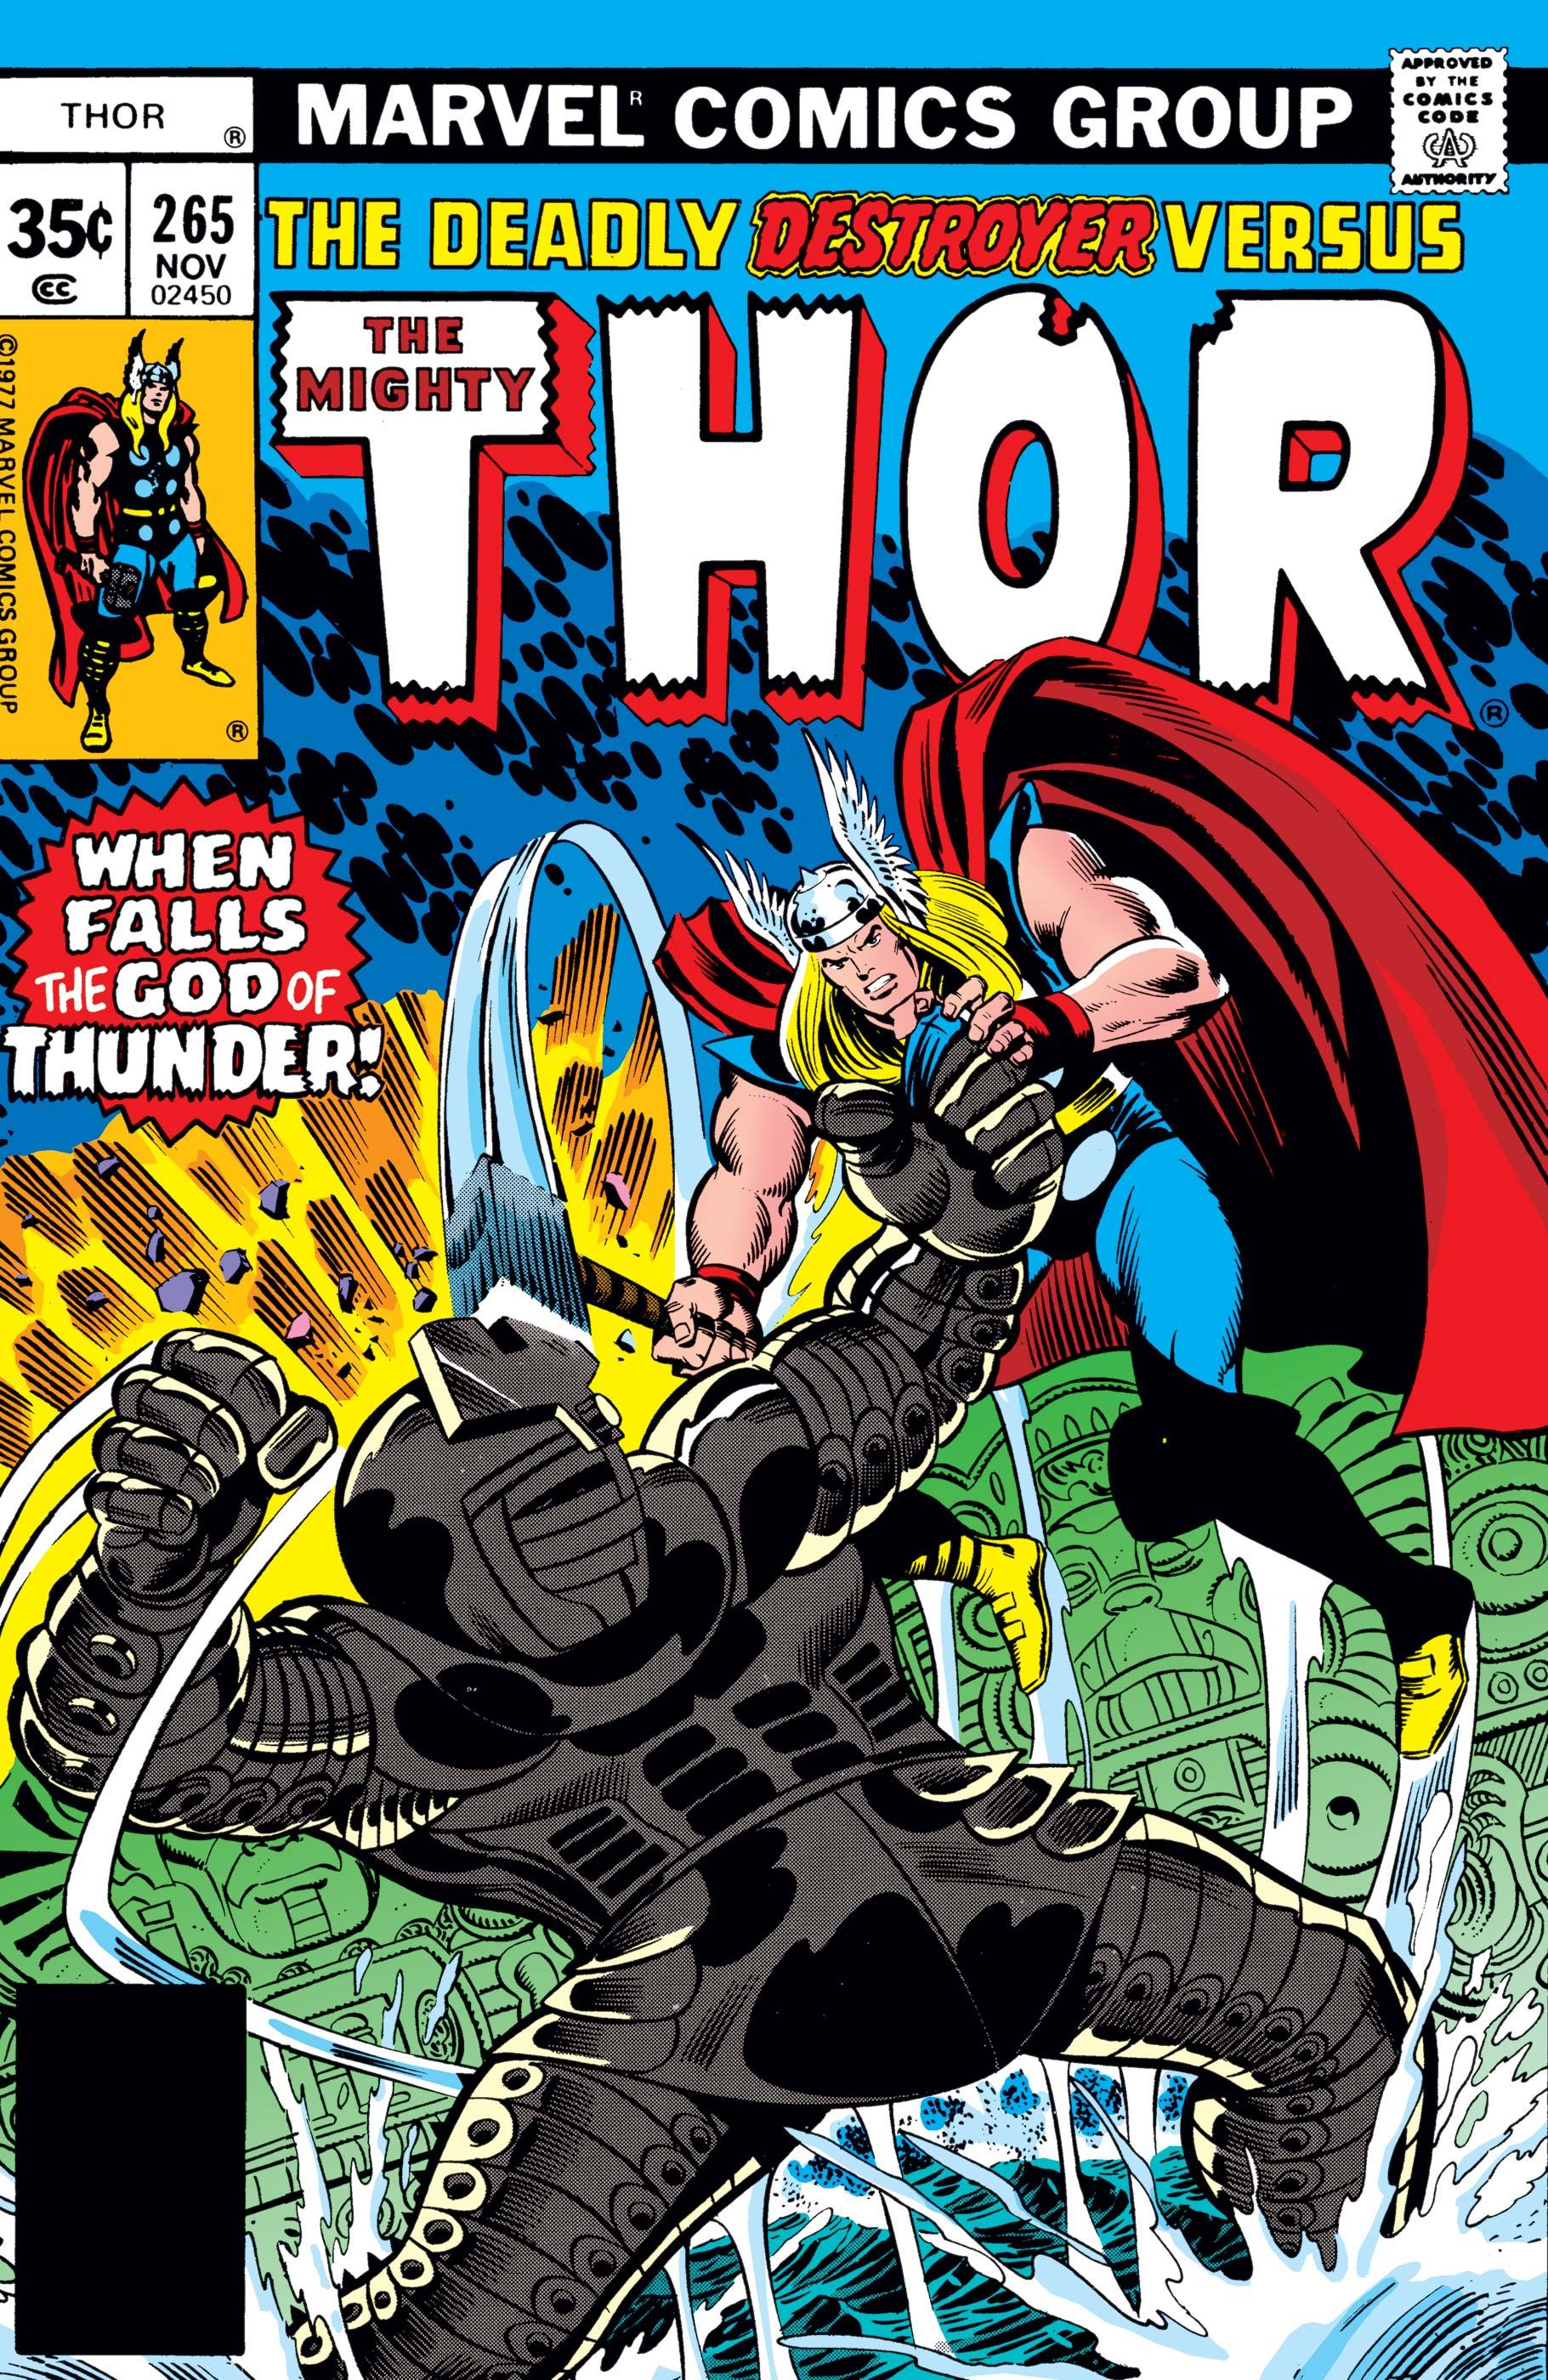 Thor (1966) #265